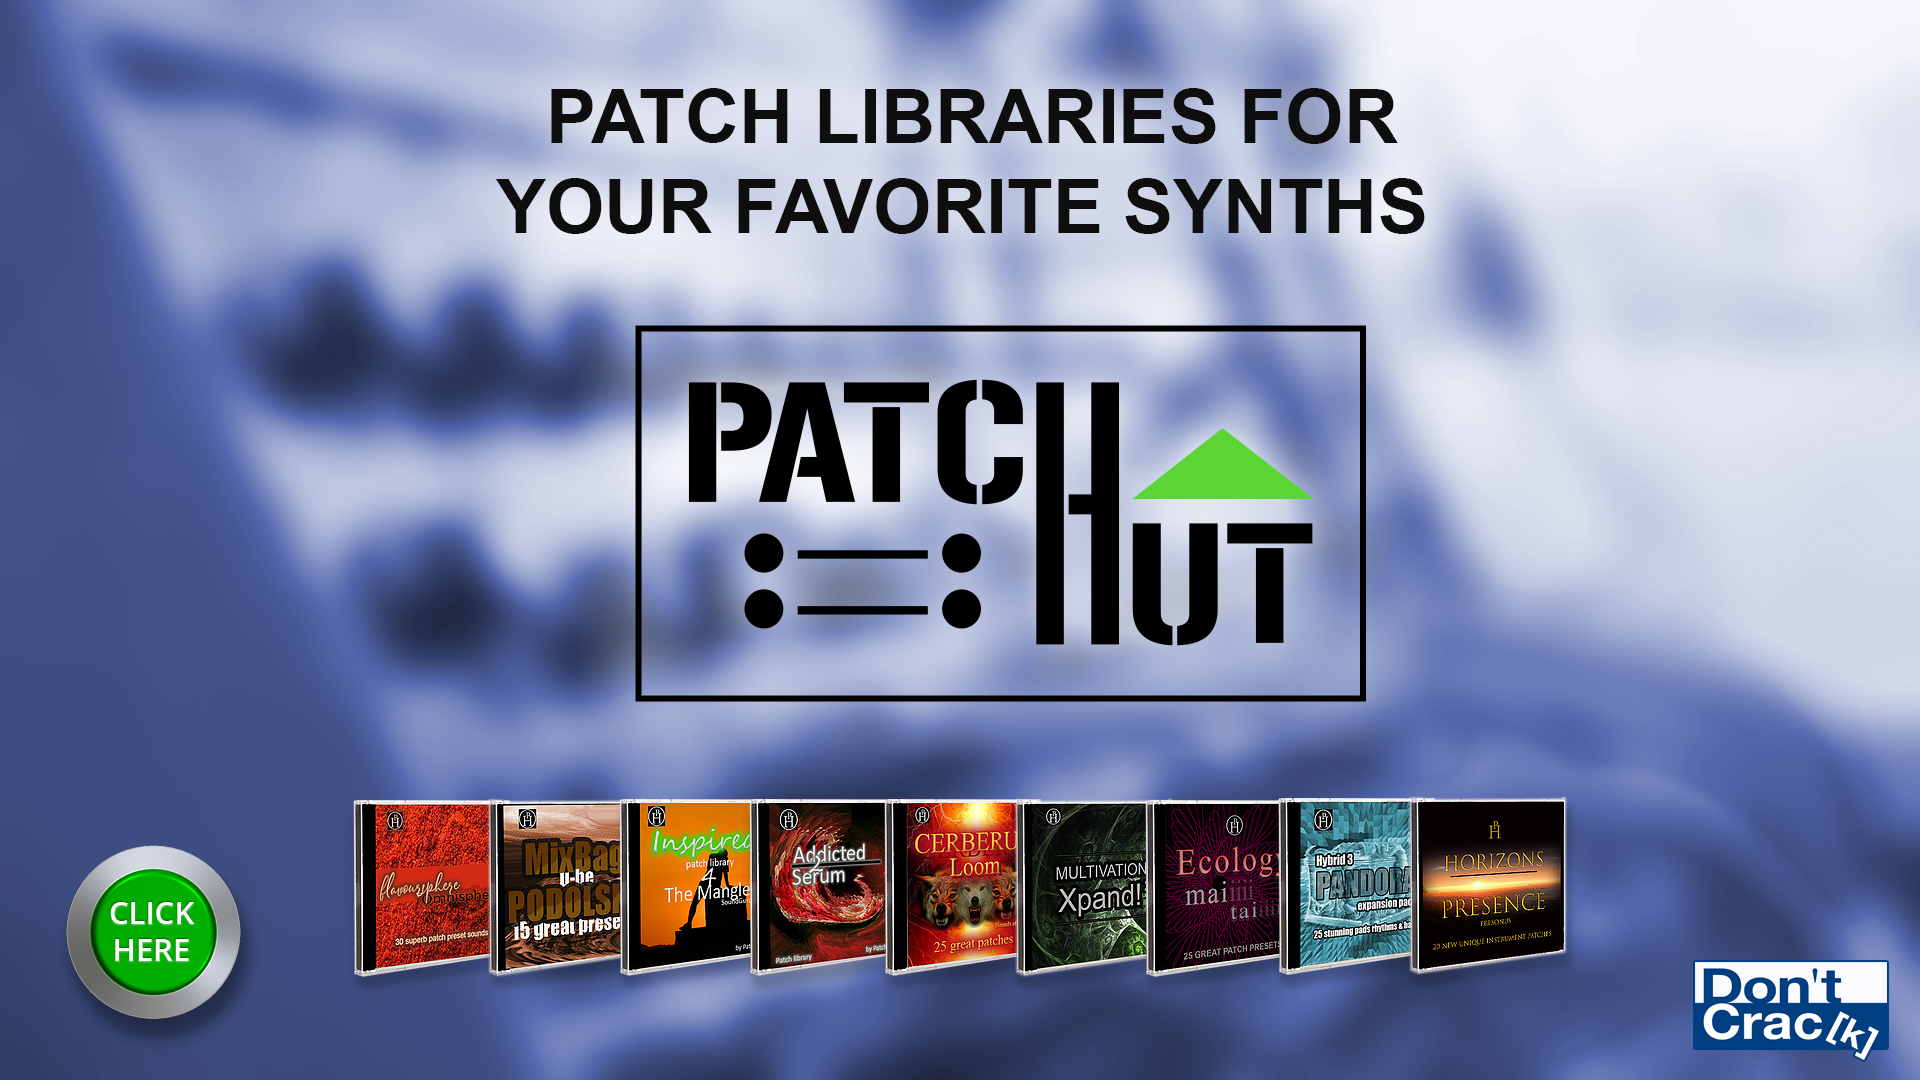 Patch Hut Sound & Preset Libraries